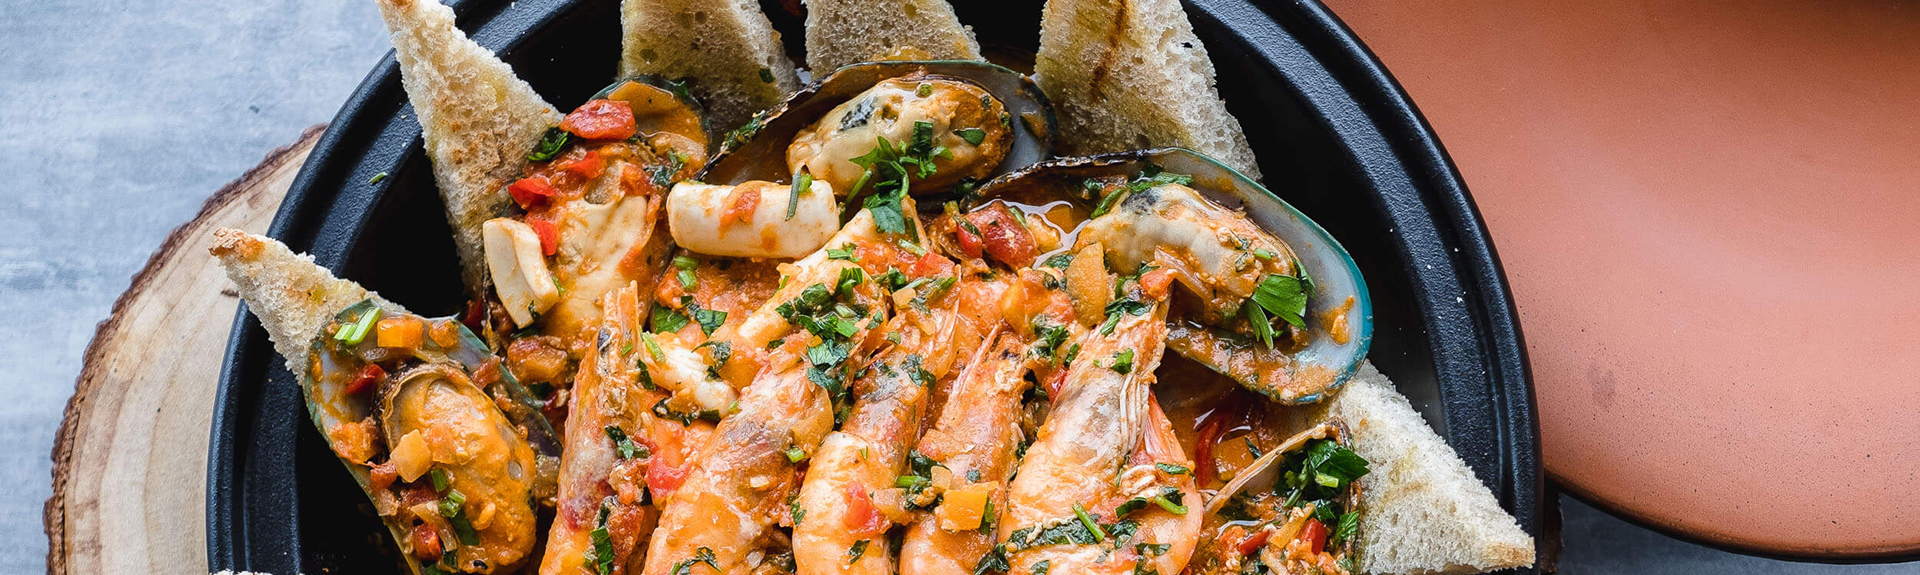 vestigius-bar-restaurante-lisboa-caissodre-menu-tejo-lx-restaurant-gastronomia (2) - Cópia